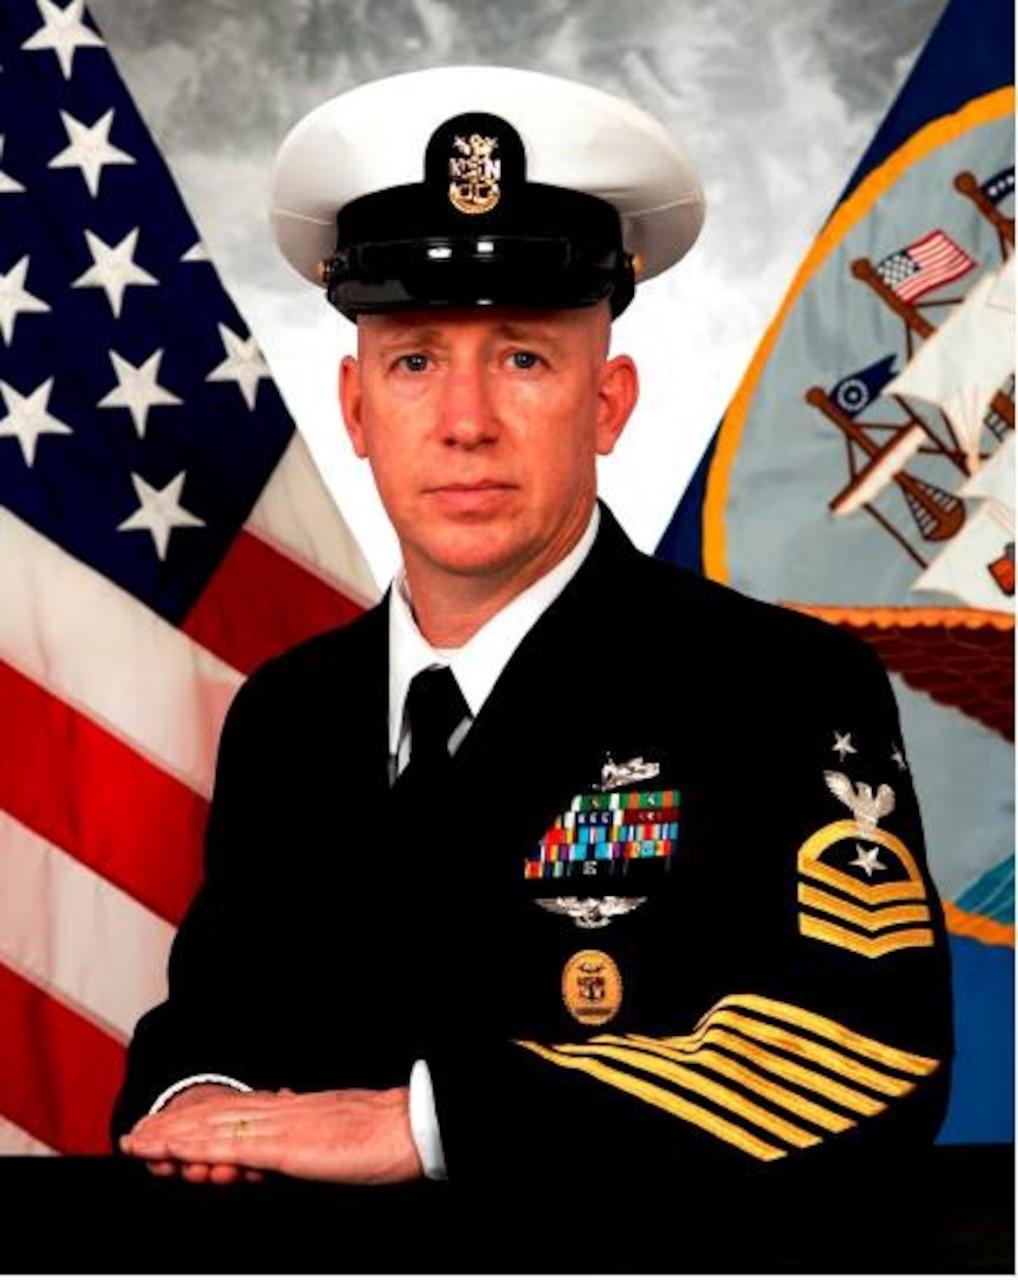 CMDCM Richard D. Curry